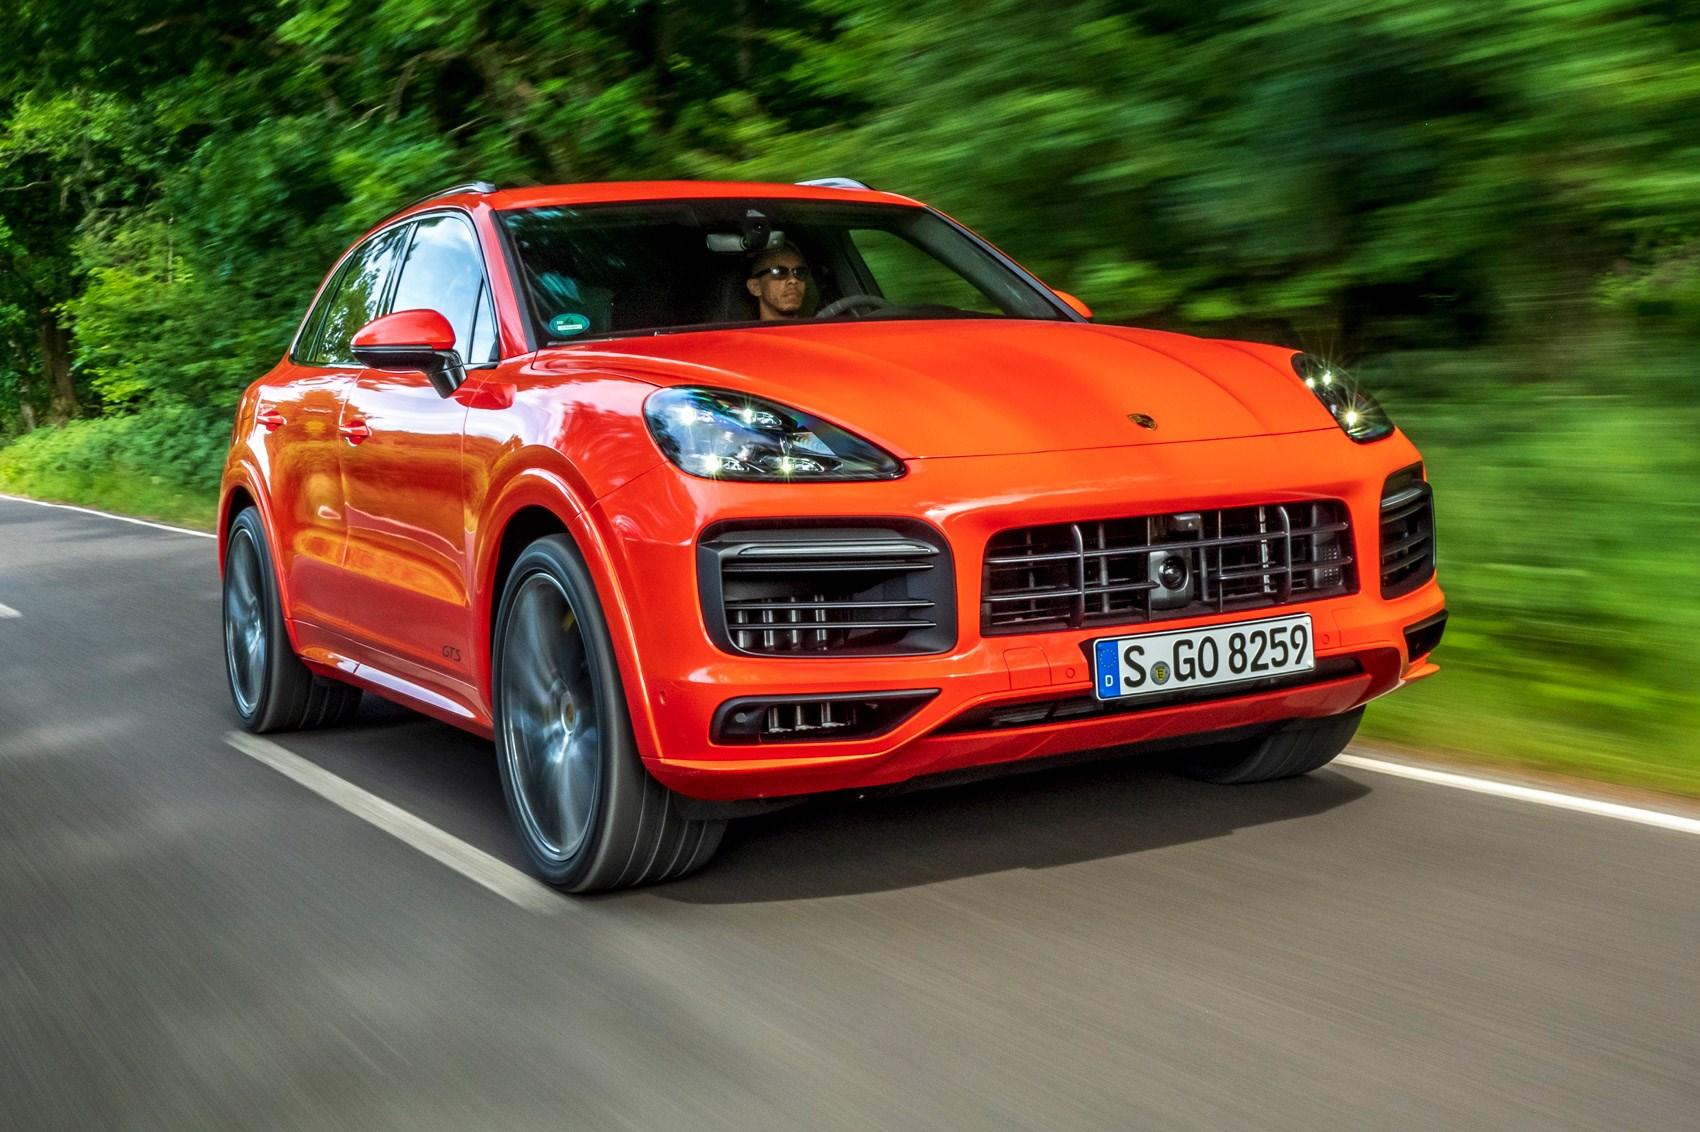 Porsche Cayenne Gts 2020 Review Adding A Little Spice Car Magazine